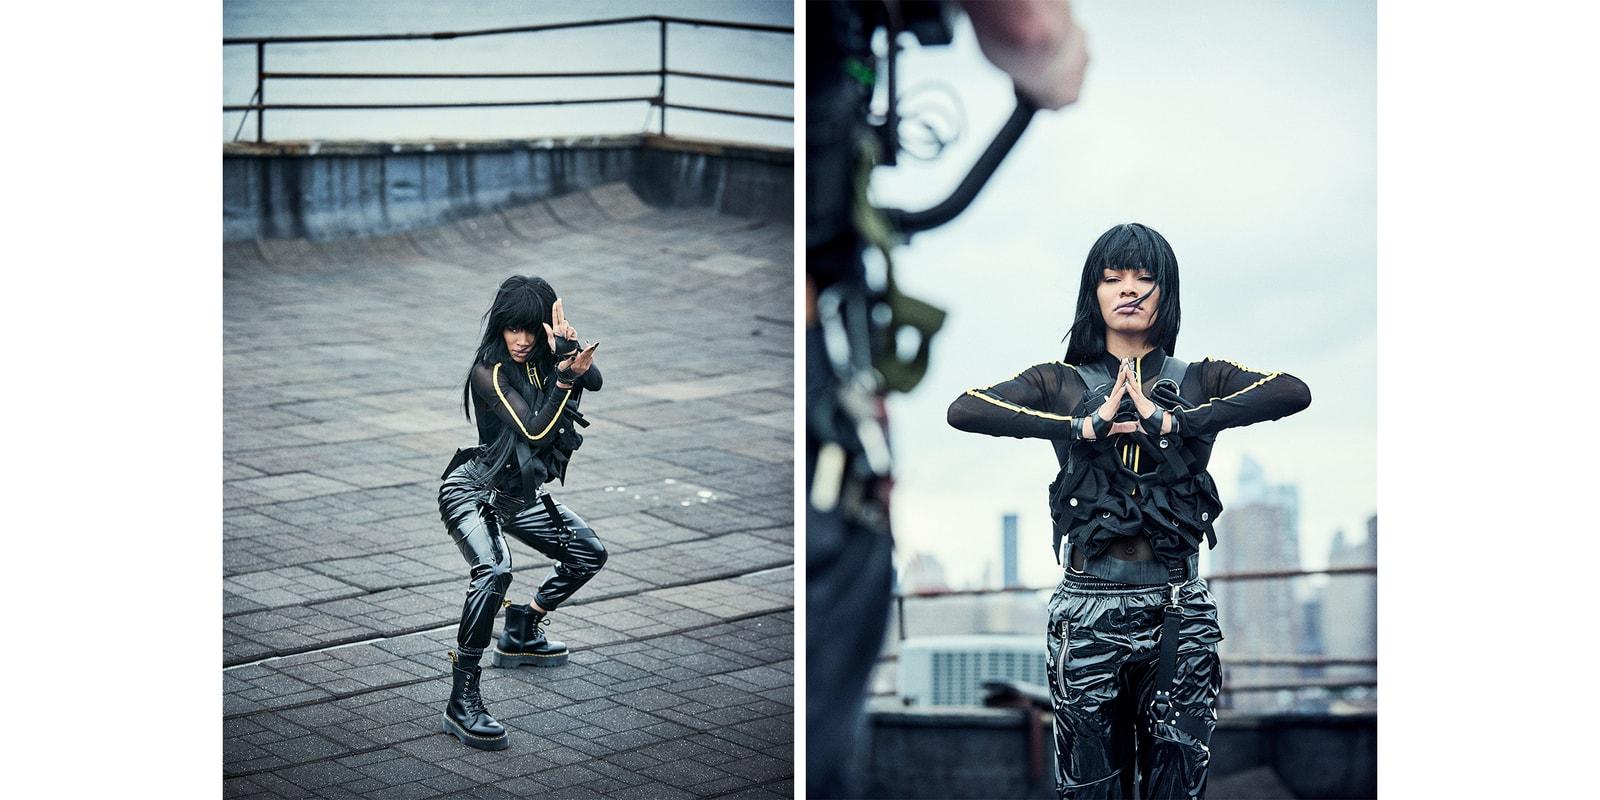 Teyana Taylor Wu-Tang x Milk Makeup Lipstick Collaboration Campaign